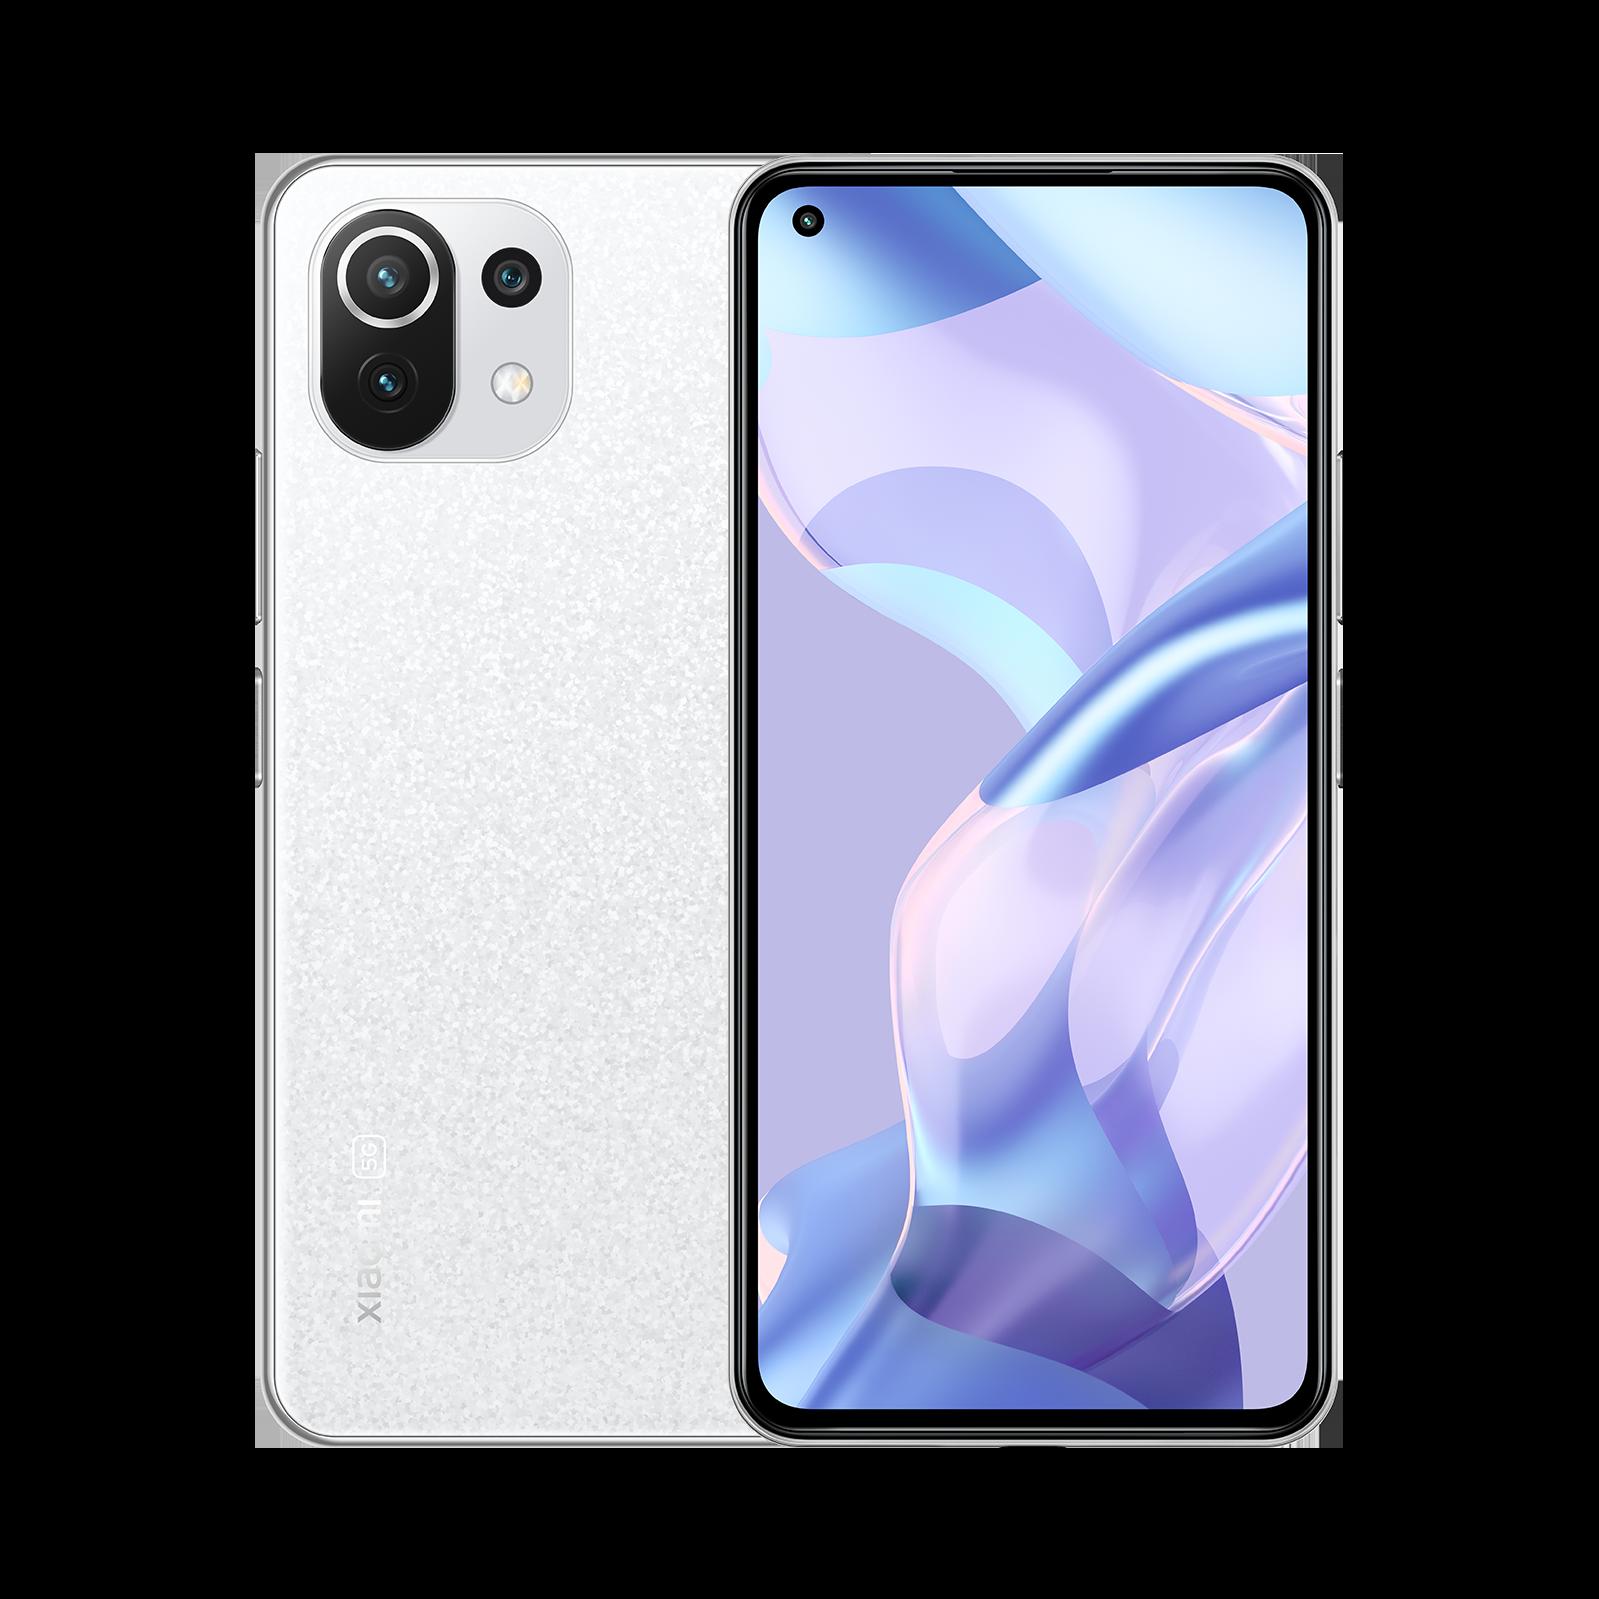 Xiaomi 11 Lite 5G NE Blanco Copo De Nieve 8GB+128GB